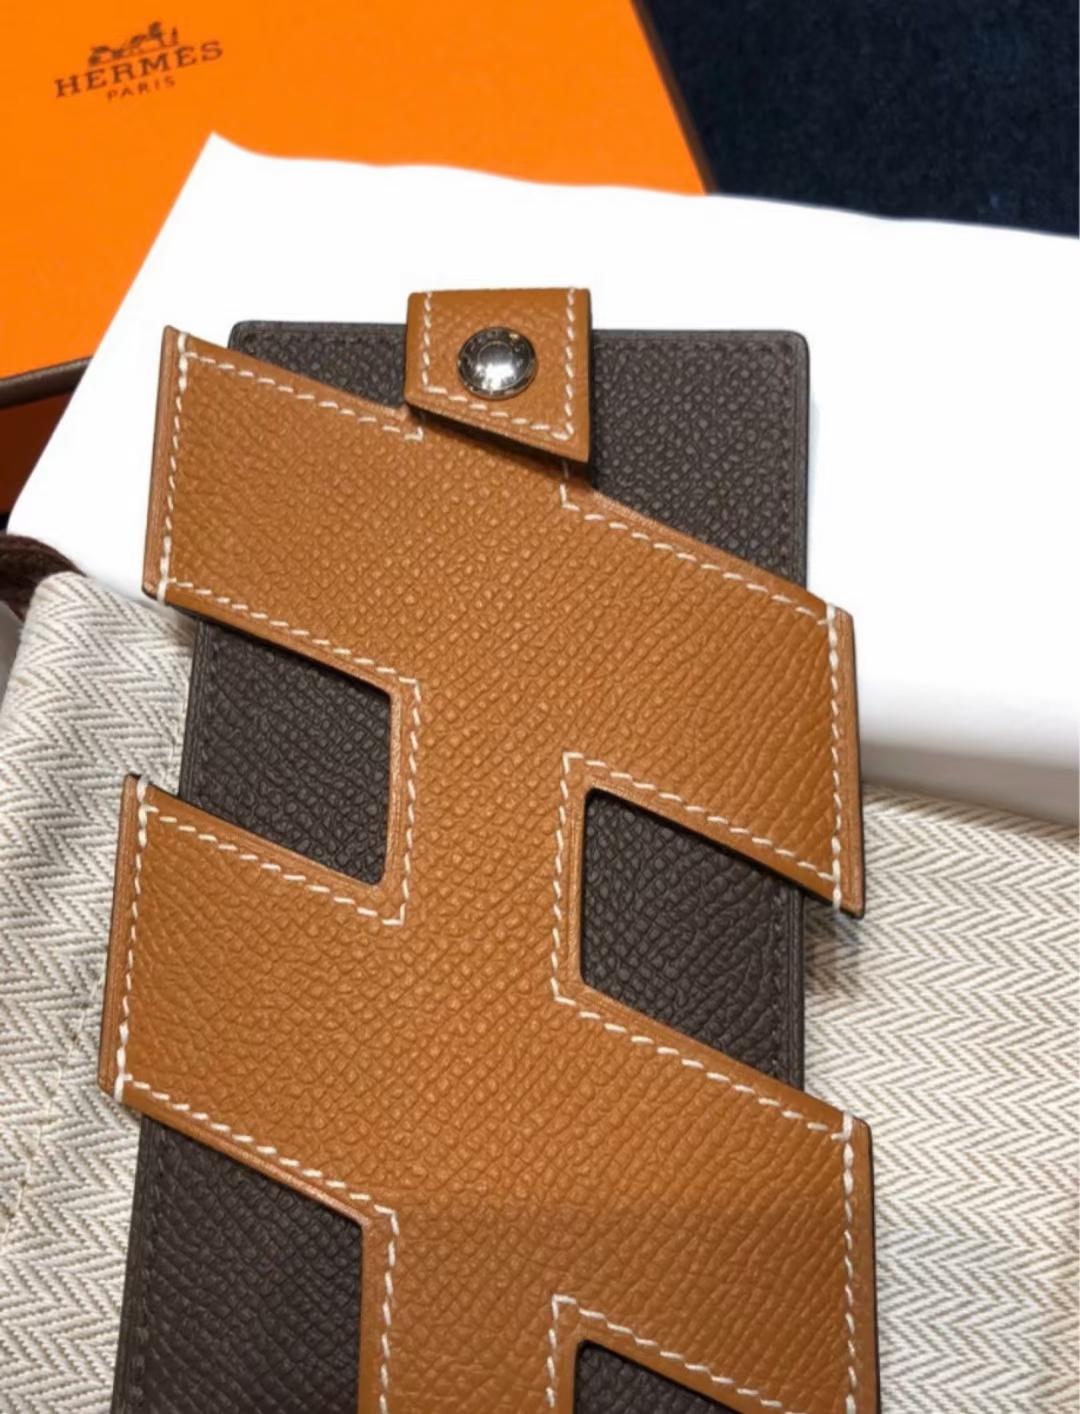 Hermès(爱马仕)走秀新款 H-Tag 手机包 金棕色